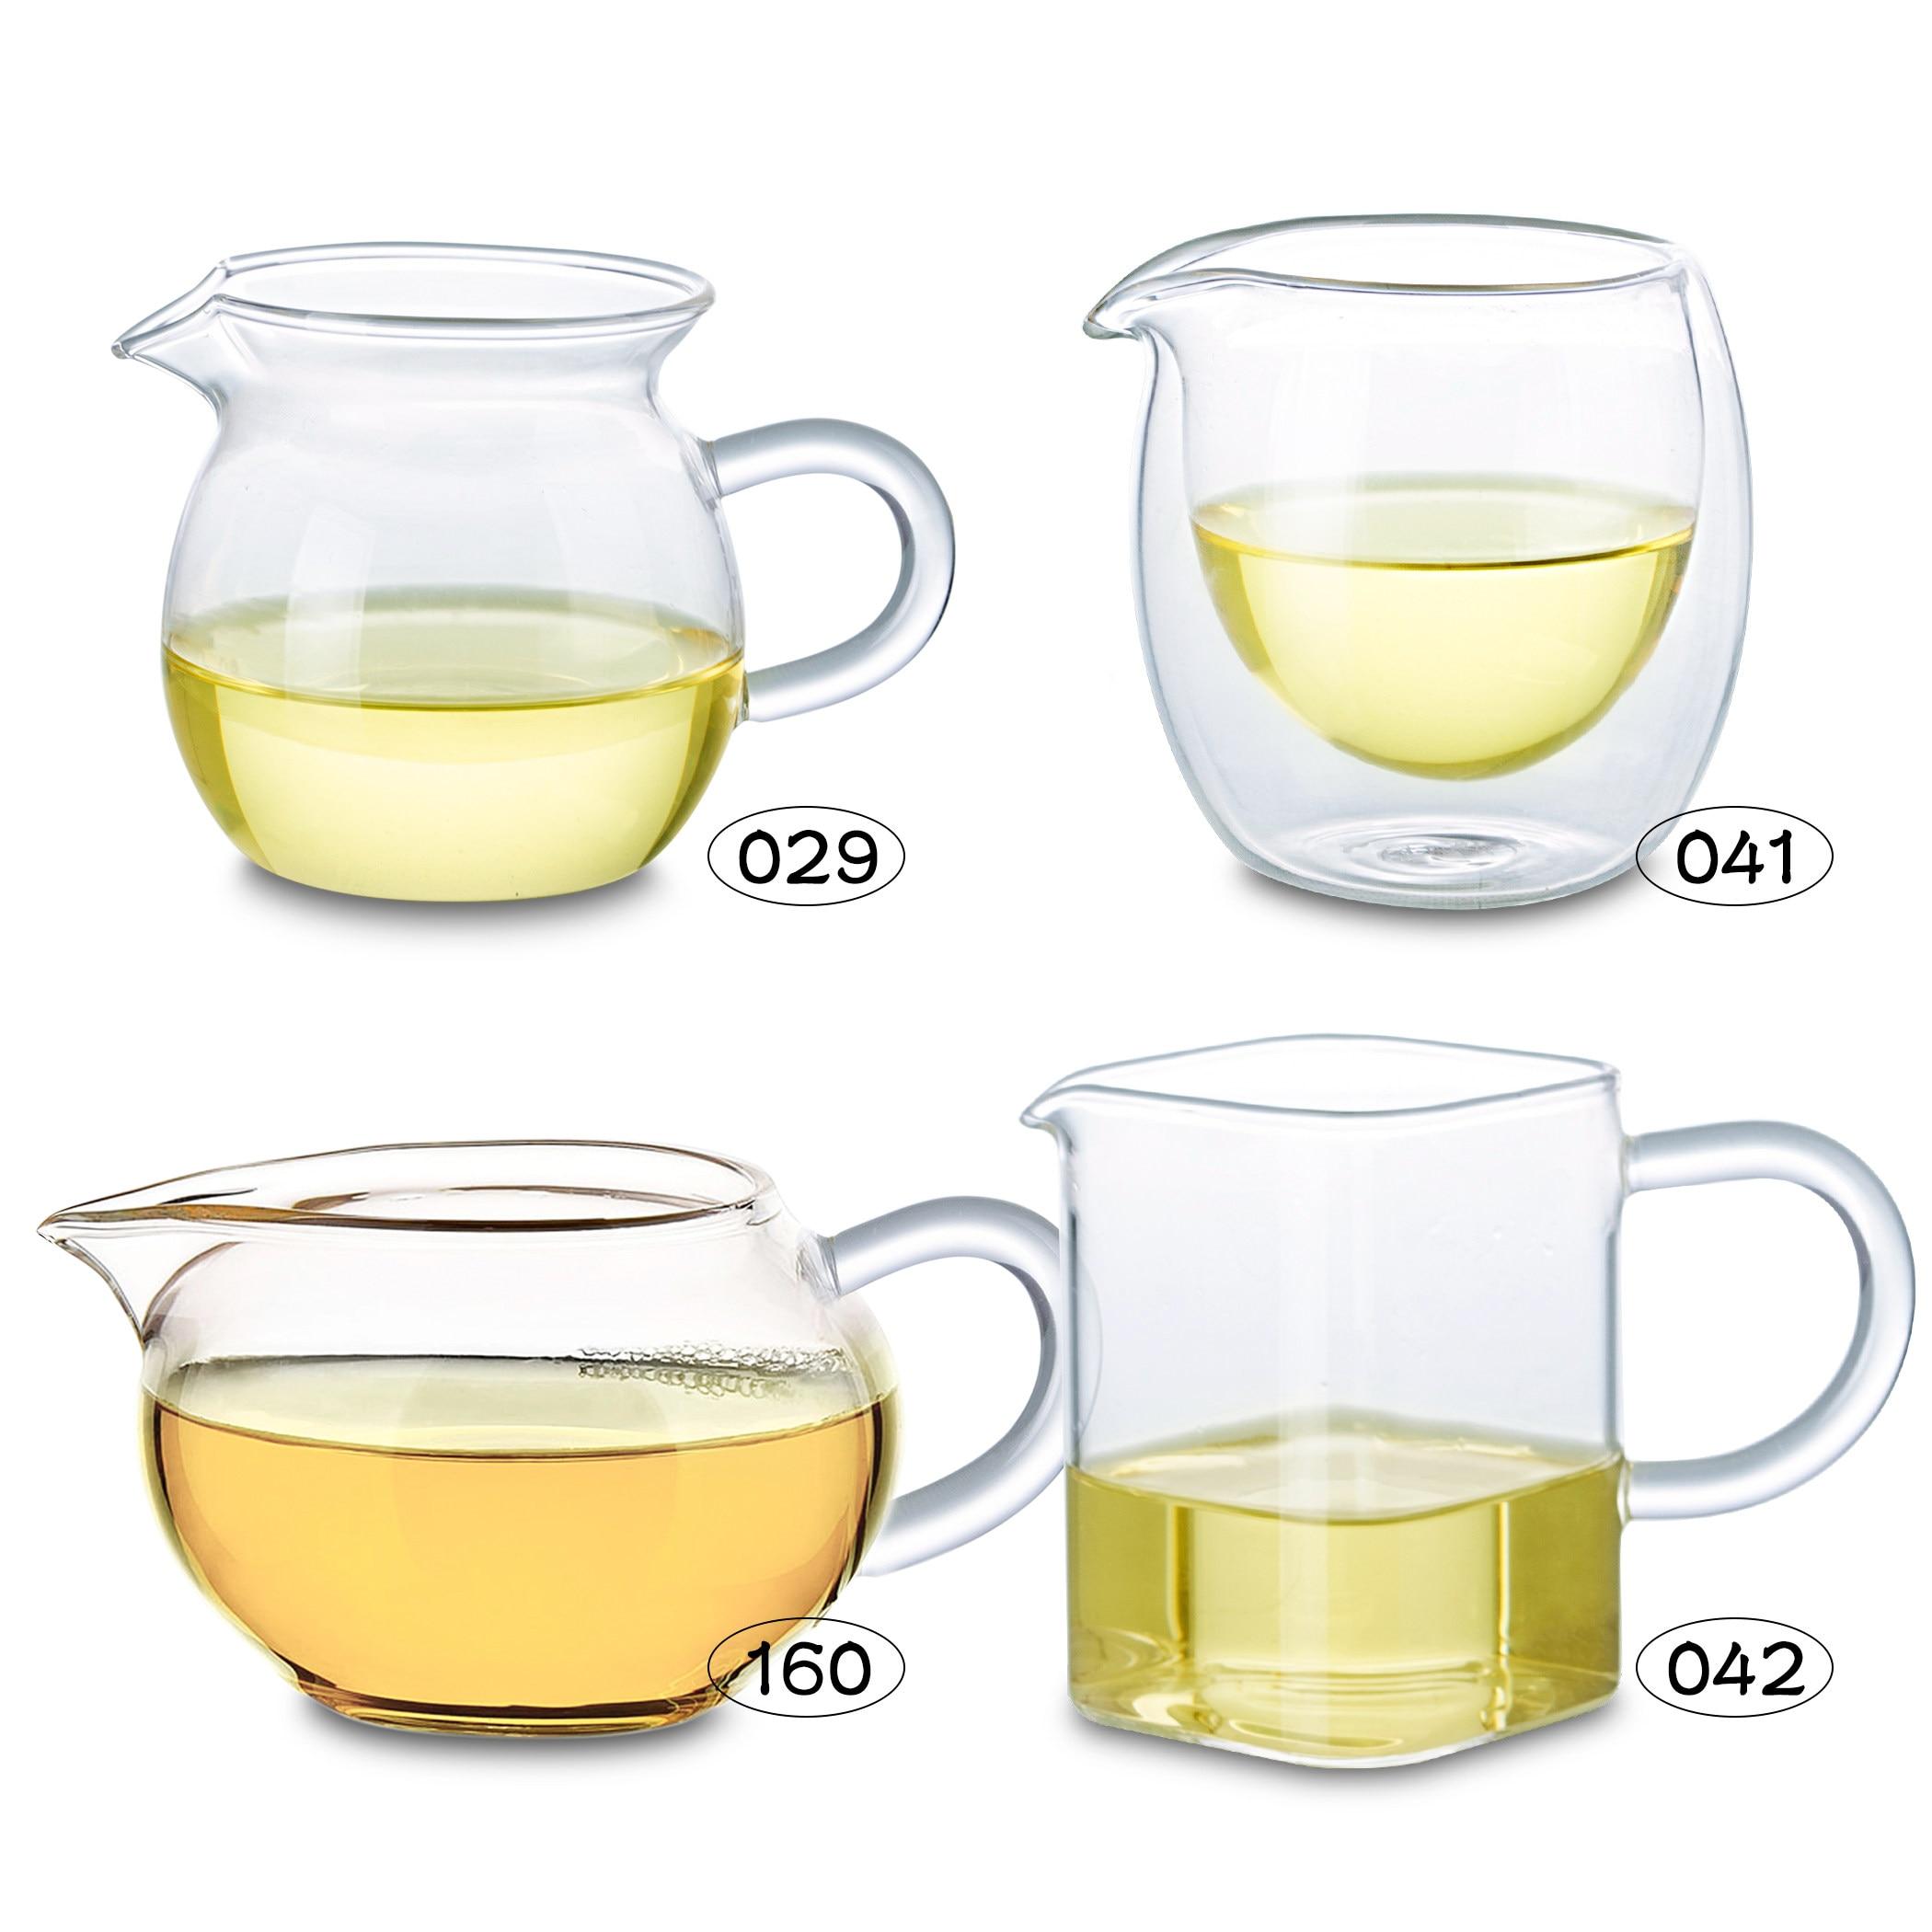 Tipos de jarra de vidrio transparente resistente al calor para servir té Gong chino fu Cha Hai